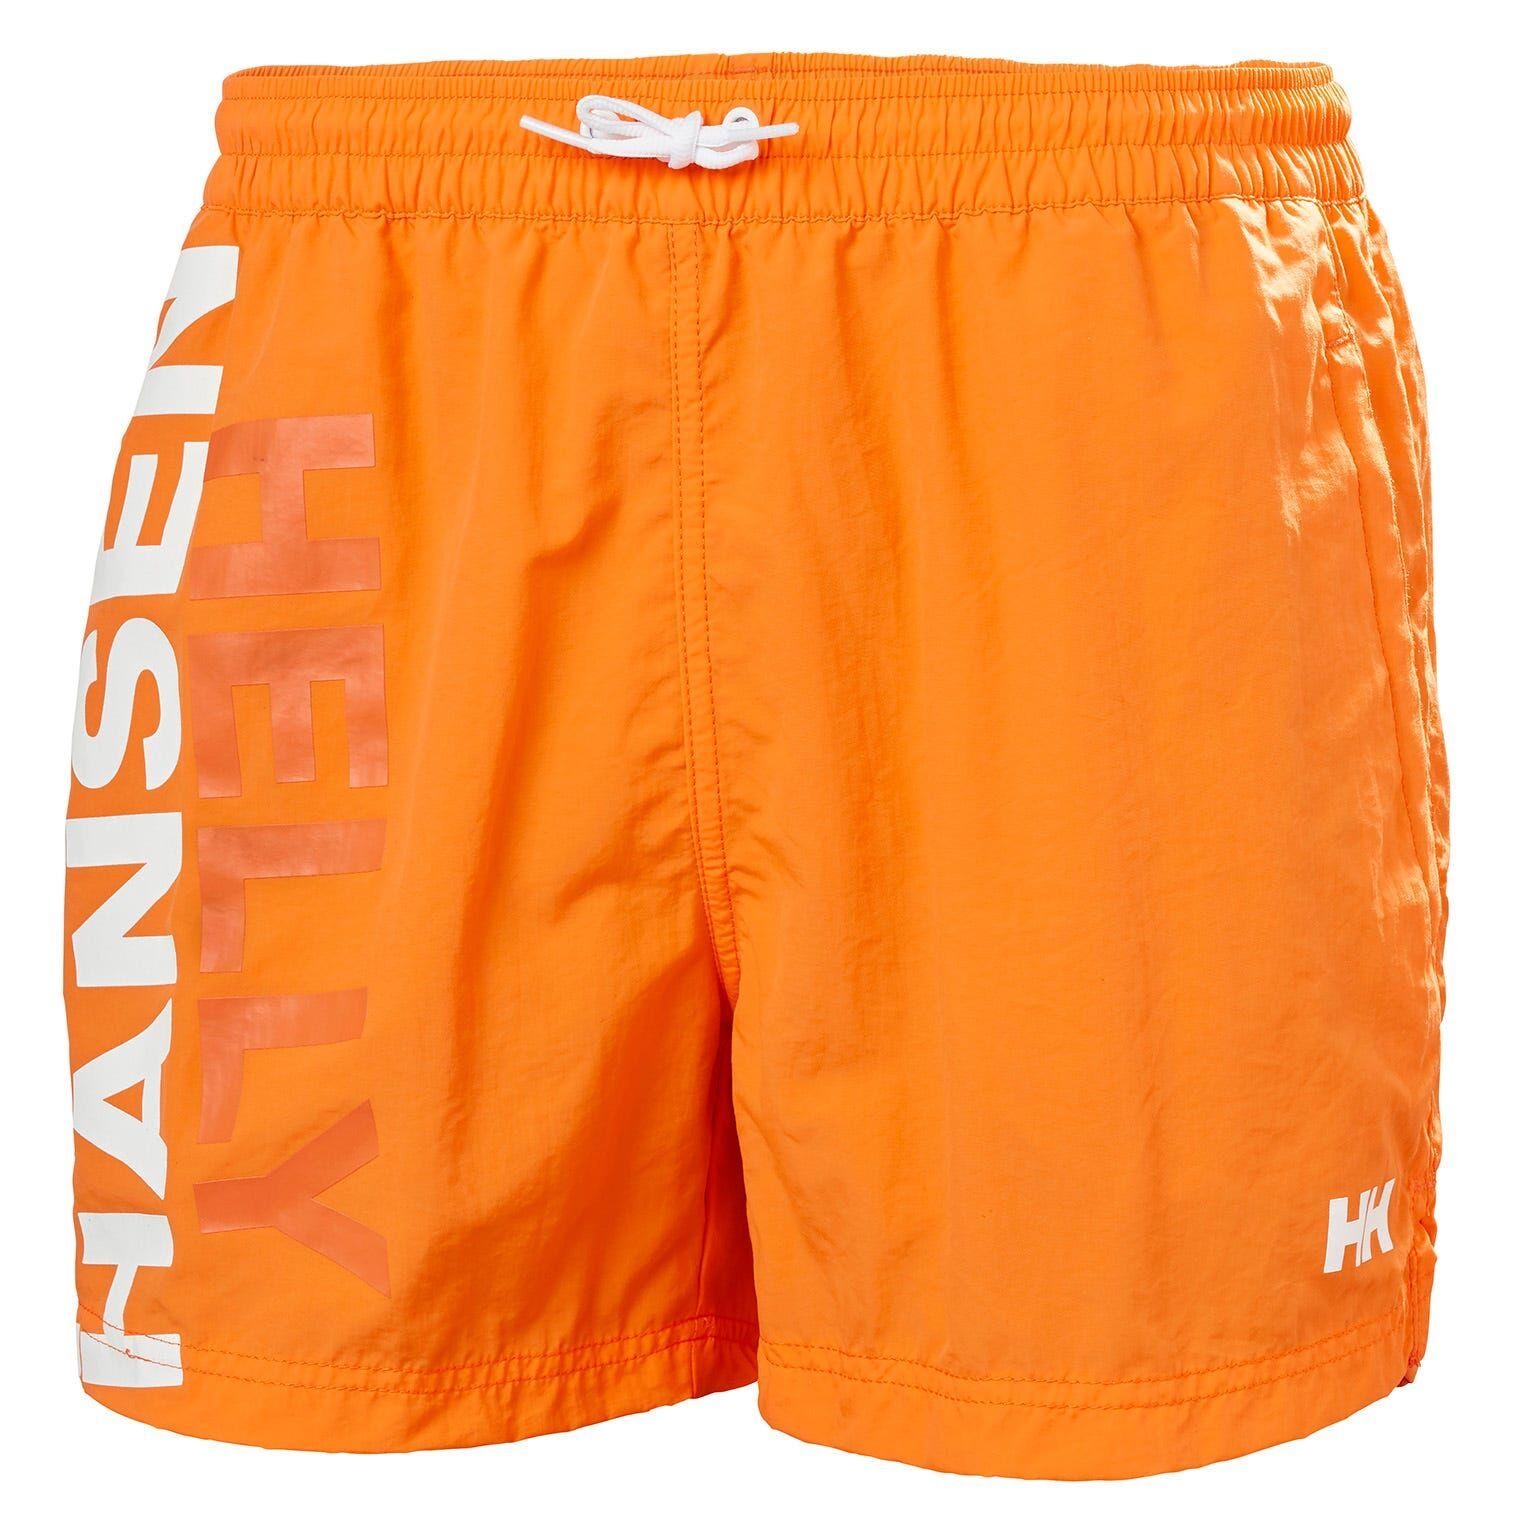 Helly Hansen Homme Cascais Trunk Pantalon De Voile Orange Xl